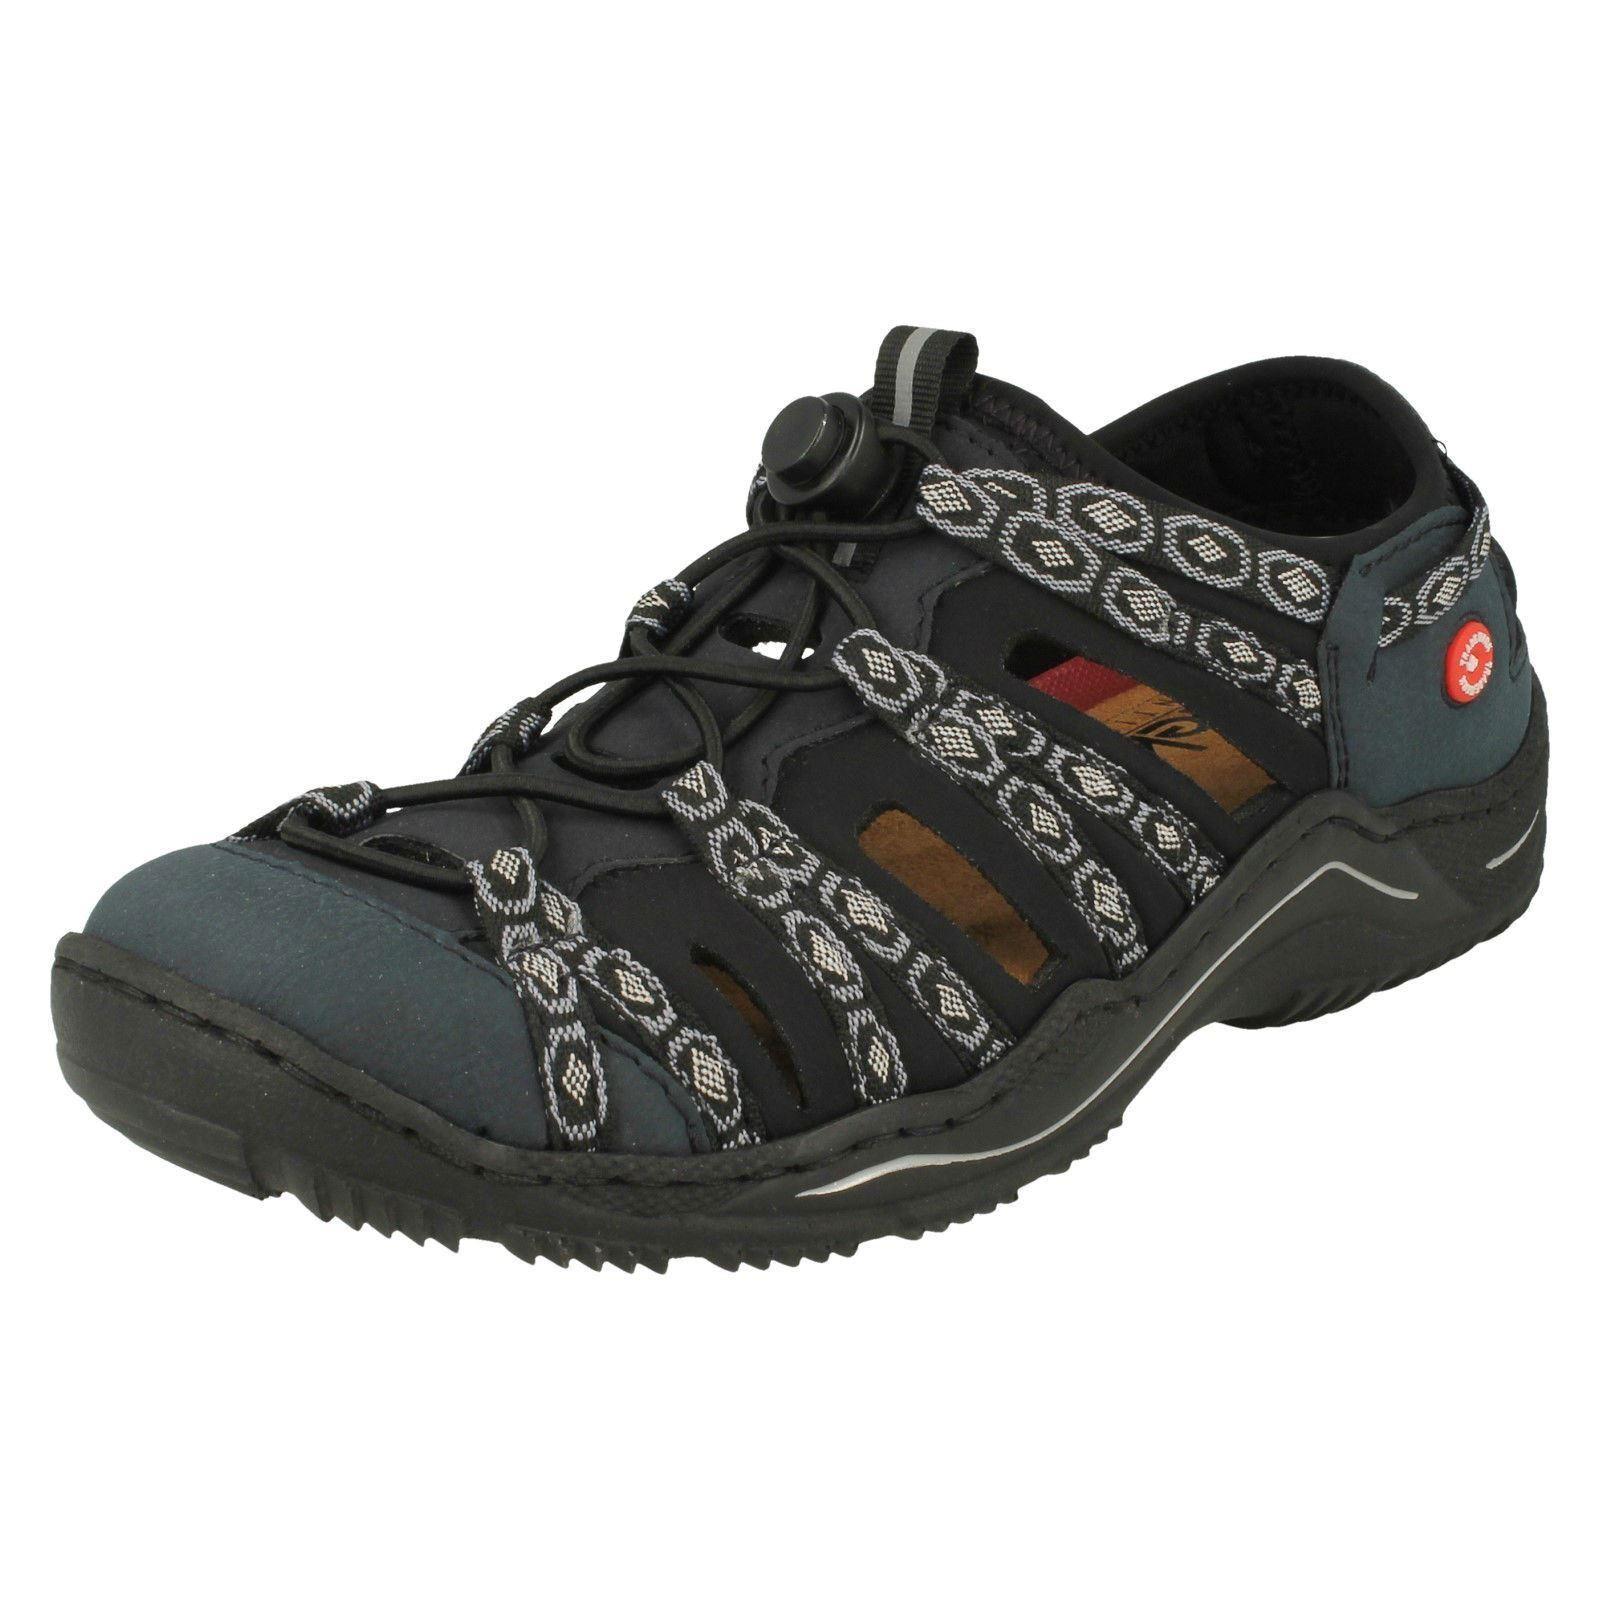 Ladies Ladies Ladies Rieker L0577 bluee Synthetic Slip On Closed Toe Sandals 4c3b20